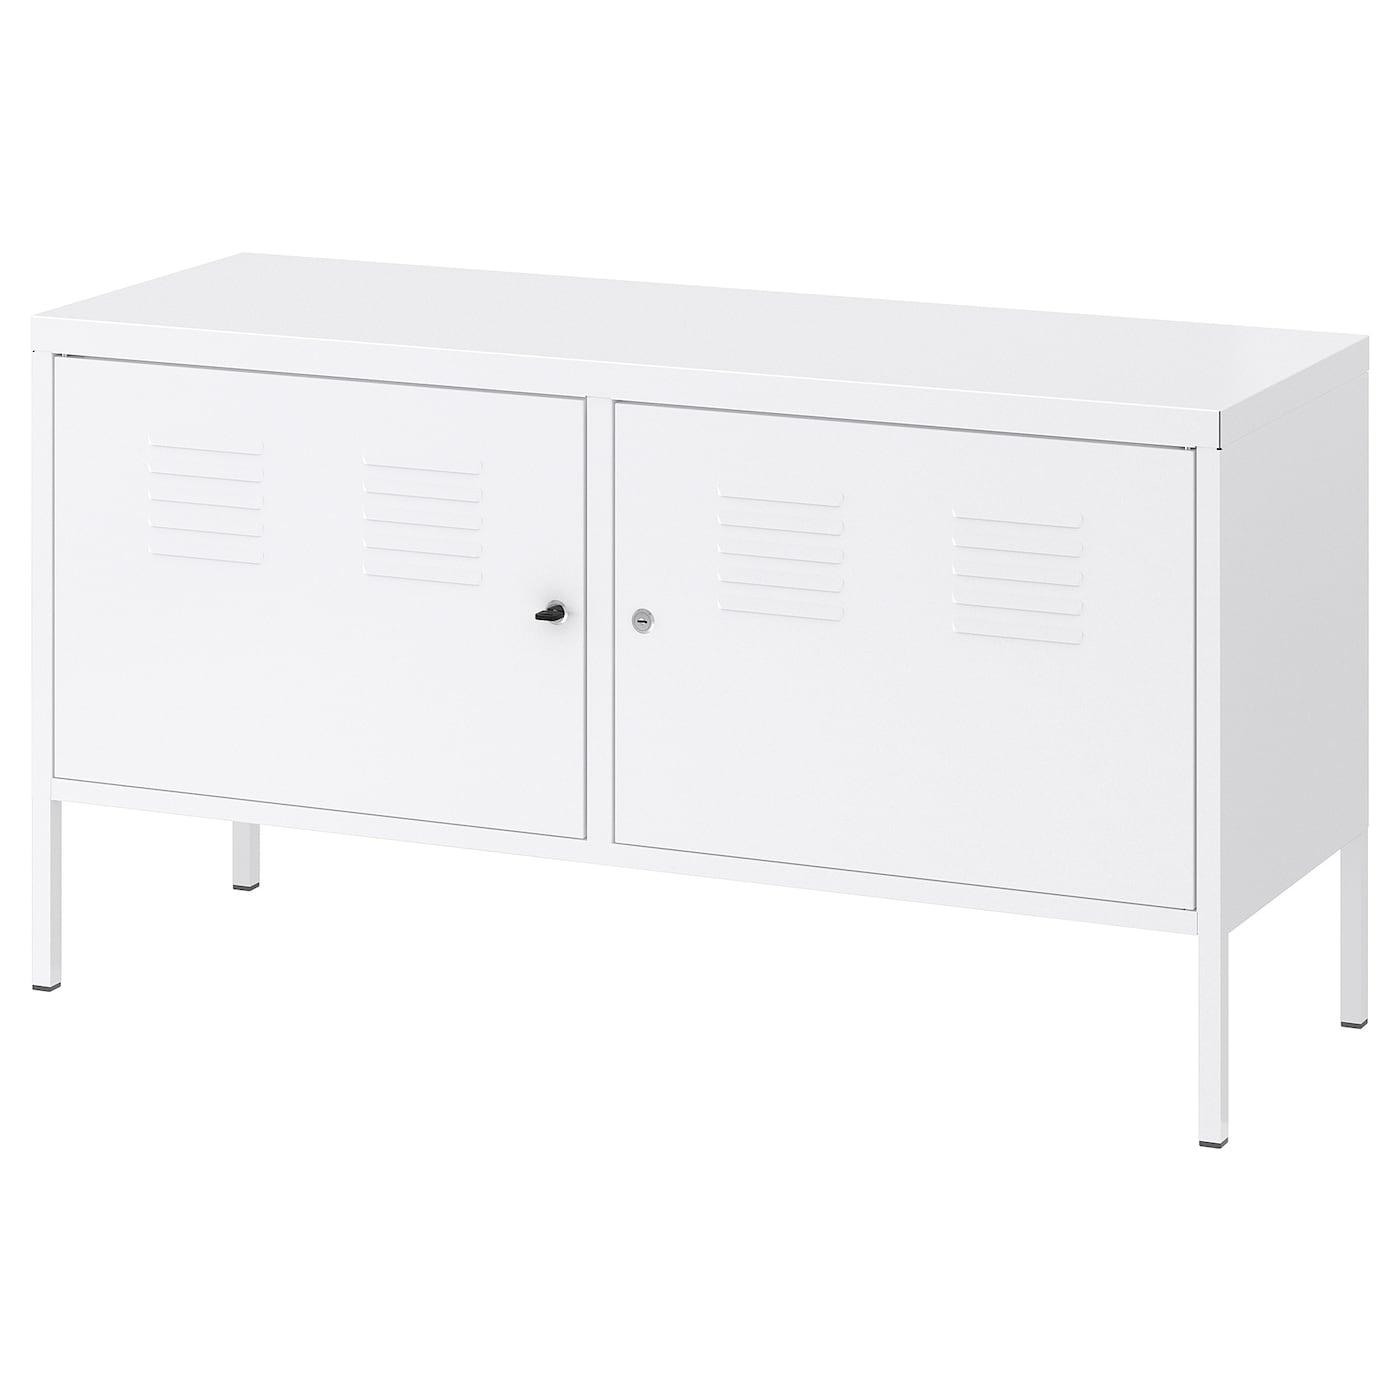 ikea ps armoire m tallique blanc 119 x 63 cm ikea. Black Bedroom Furniture Sets. Home Design Ideas